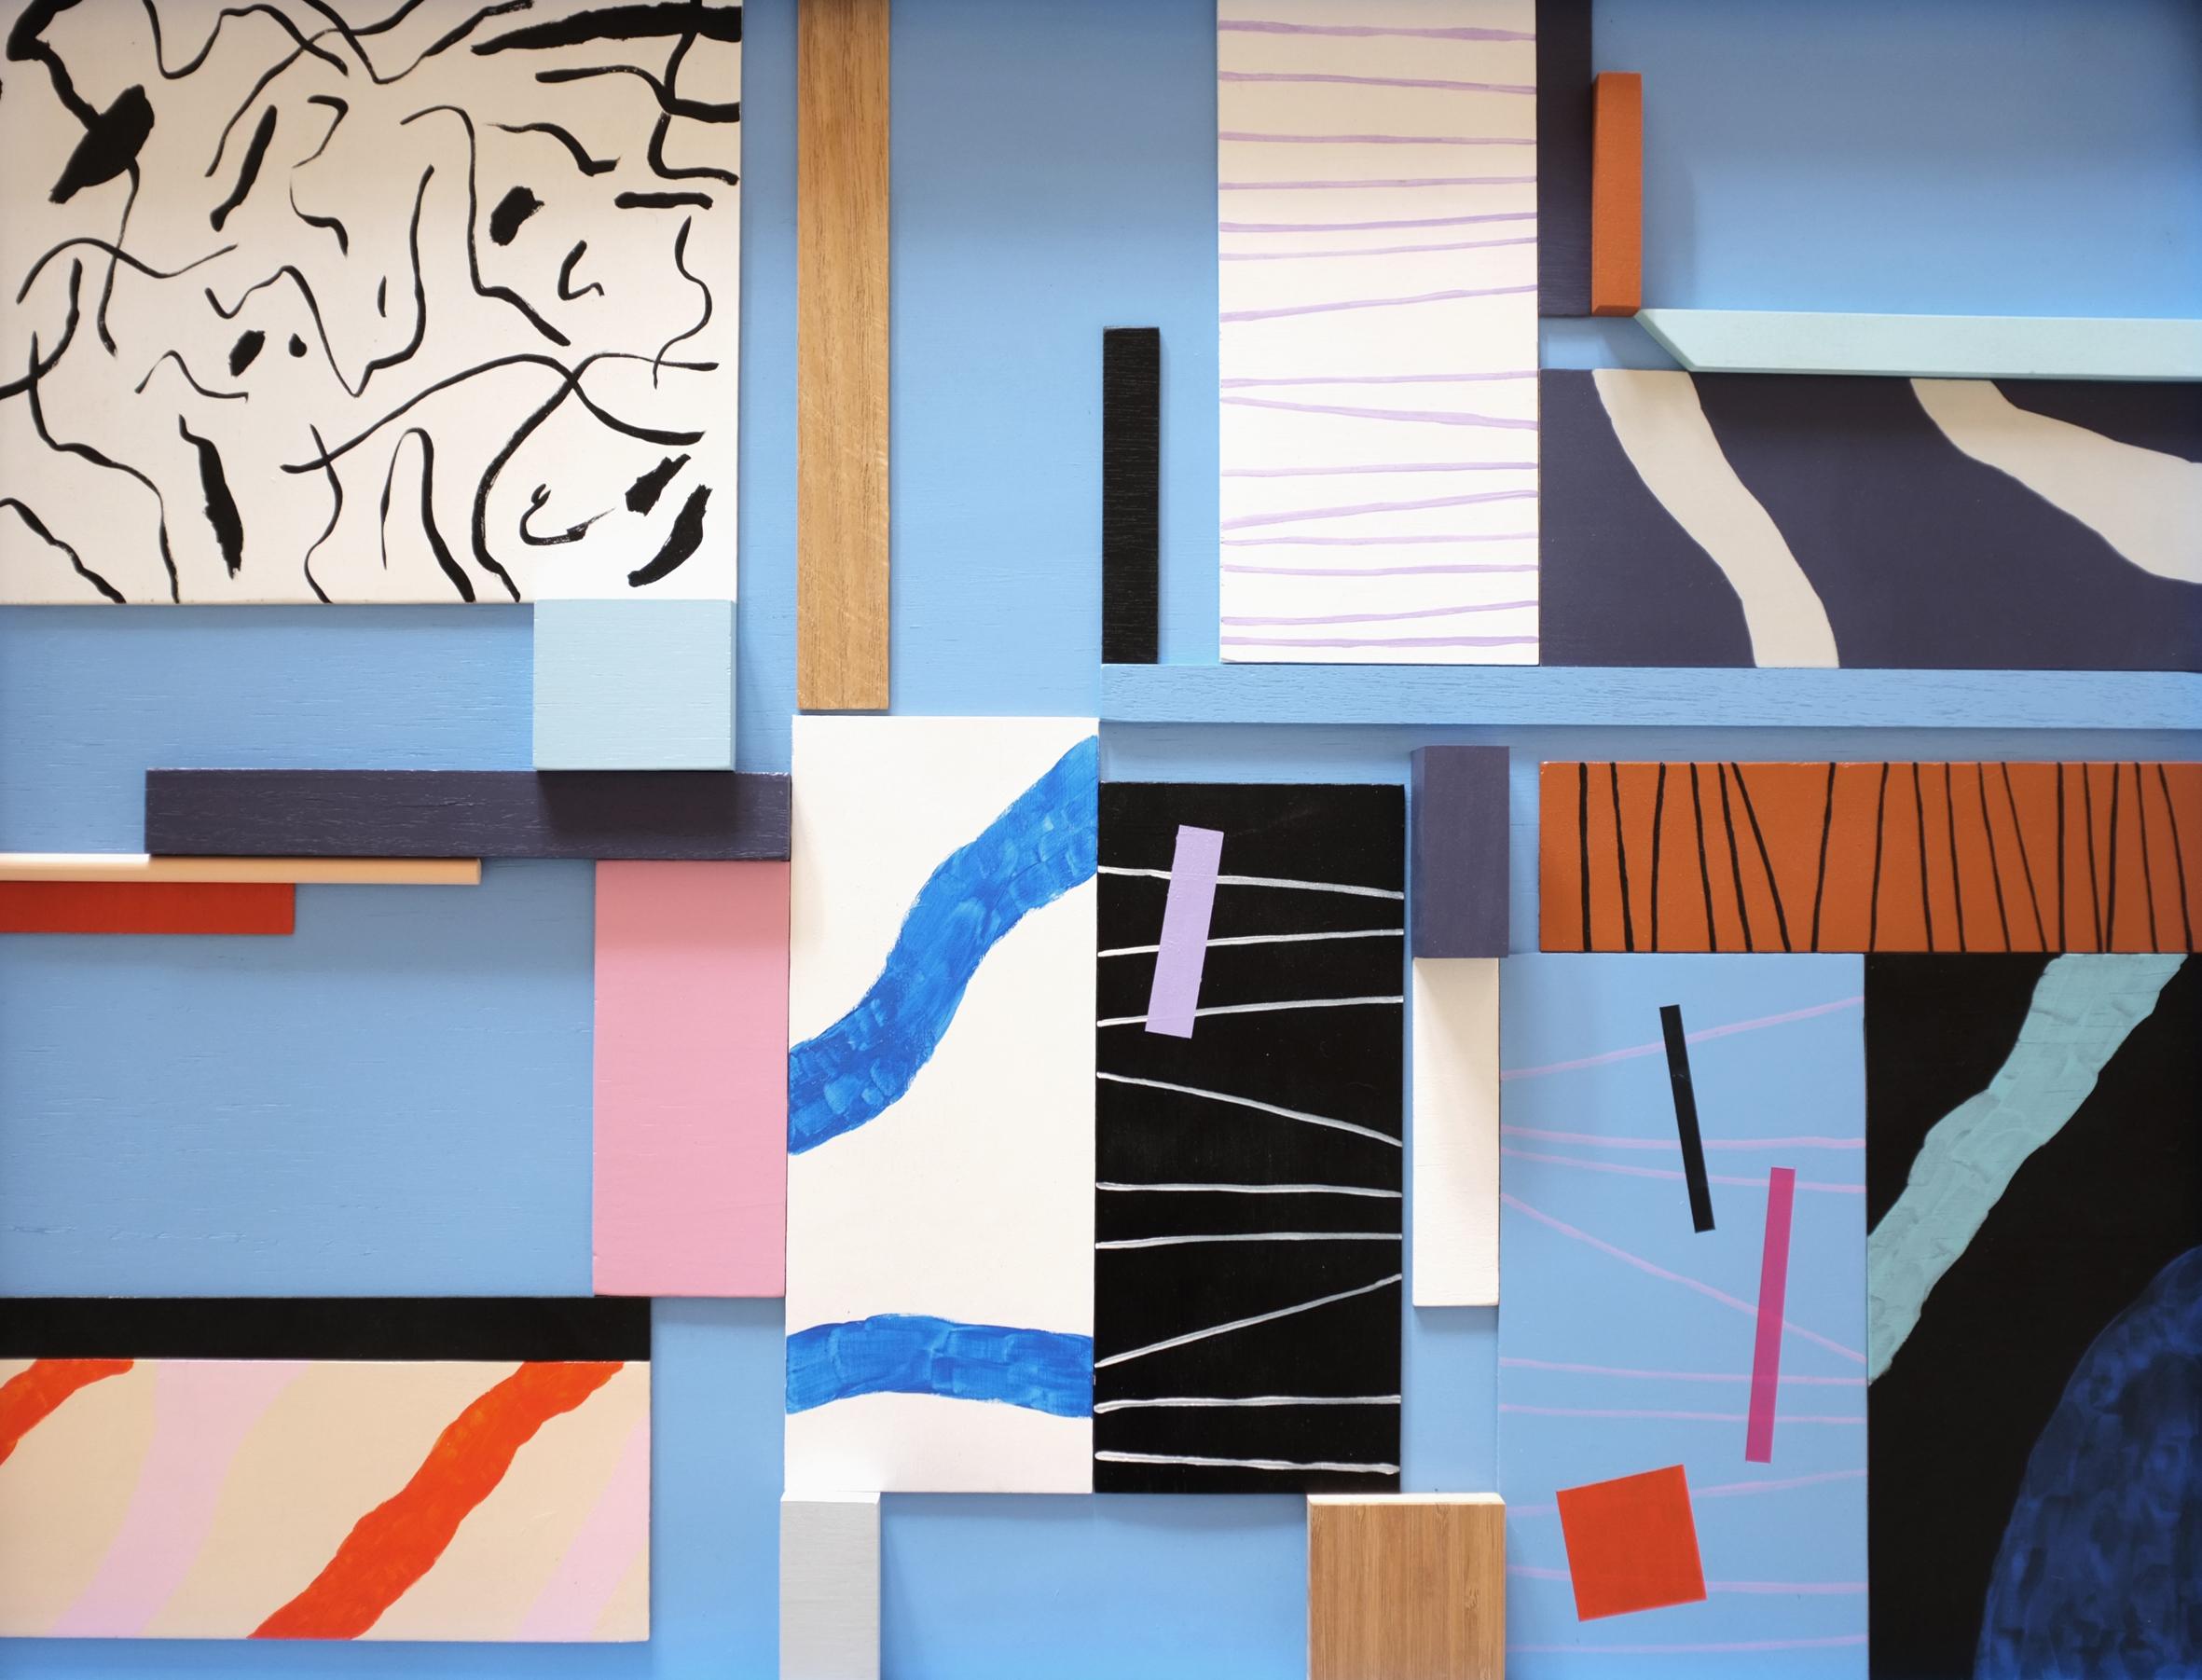 Cross Sections/ enamel, acrylic and wood on board, 2016